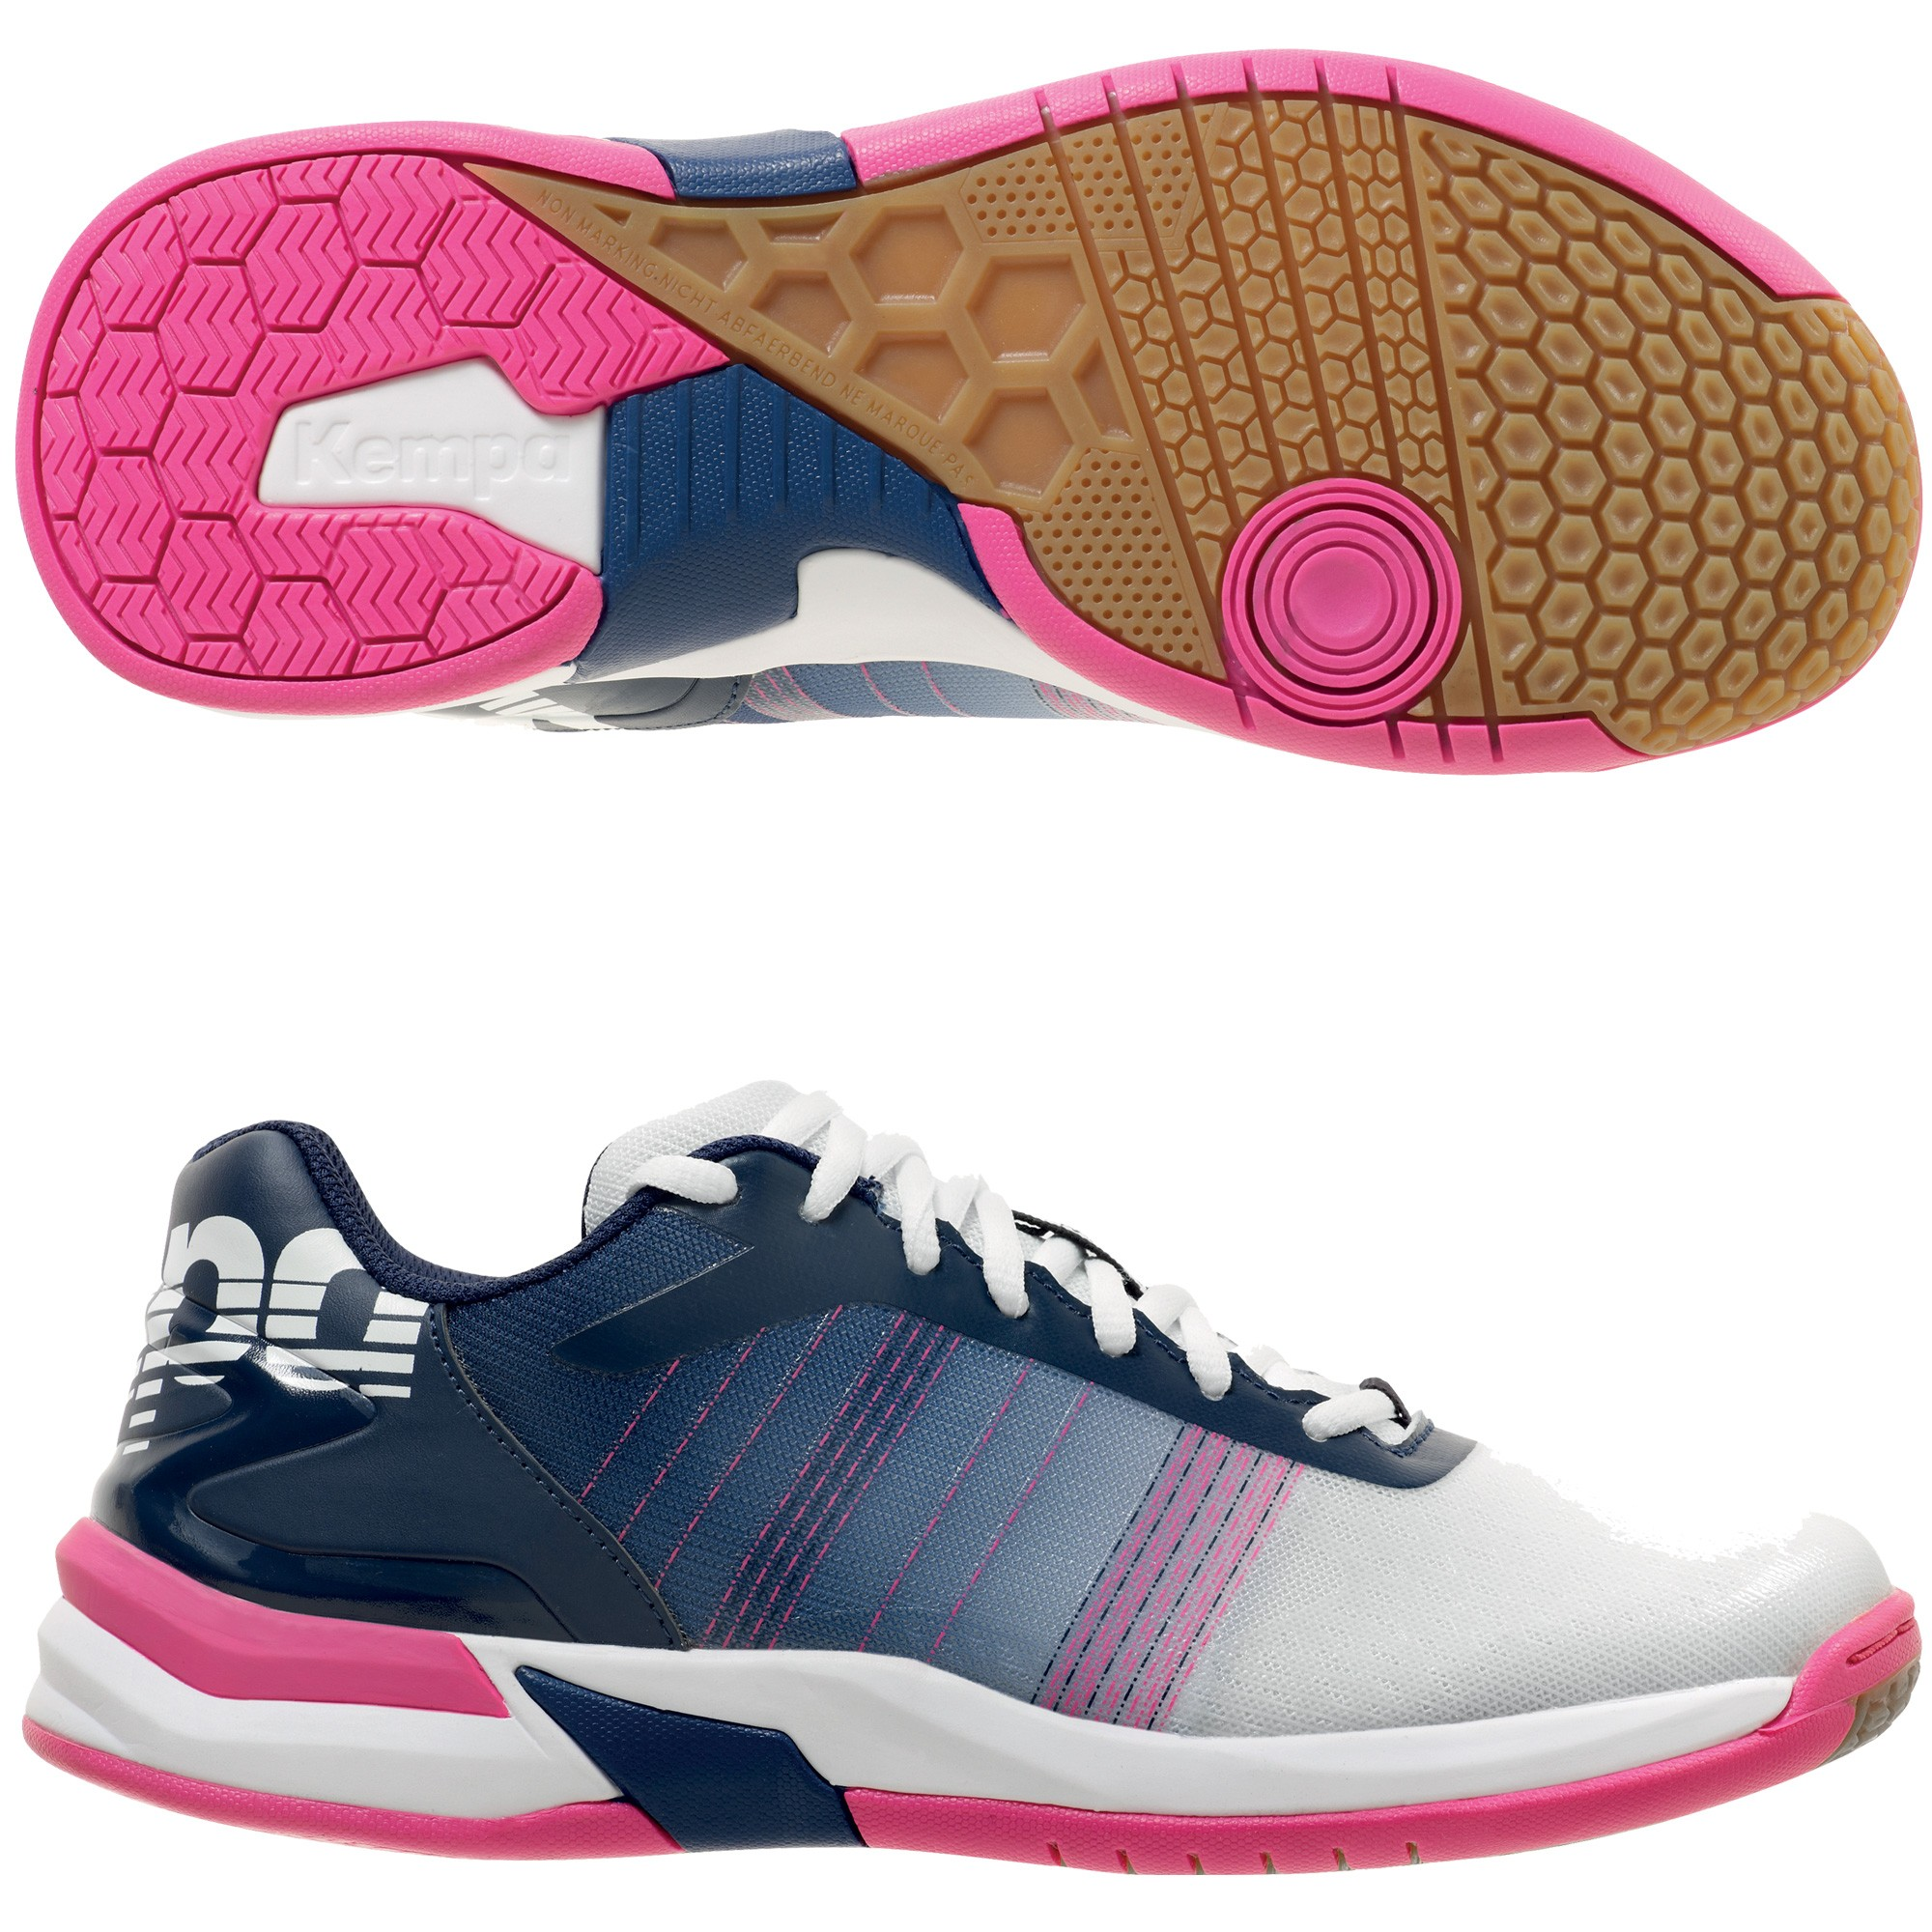 Chaussures Attack Contender Women